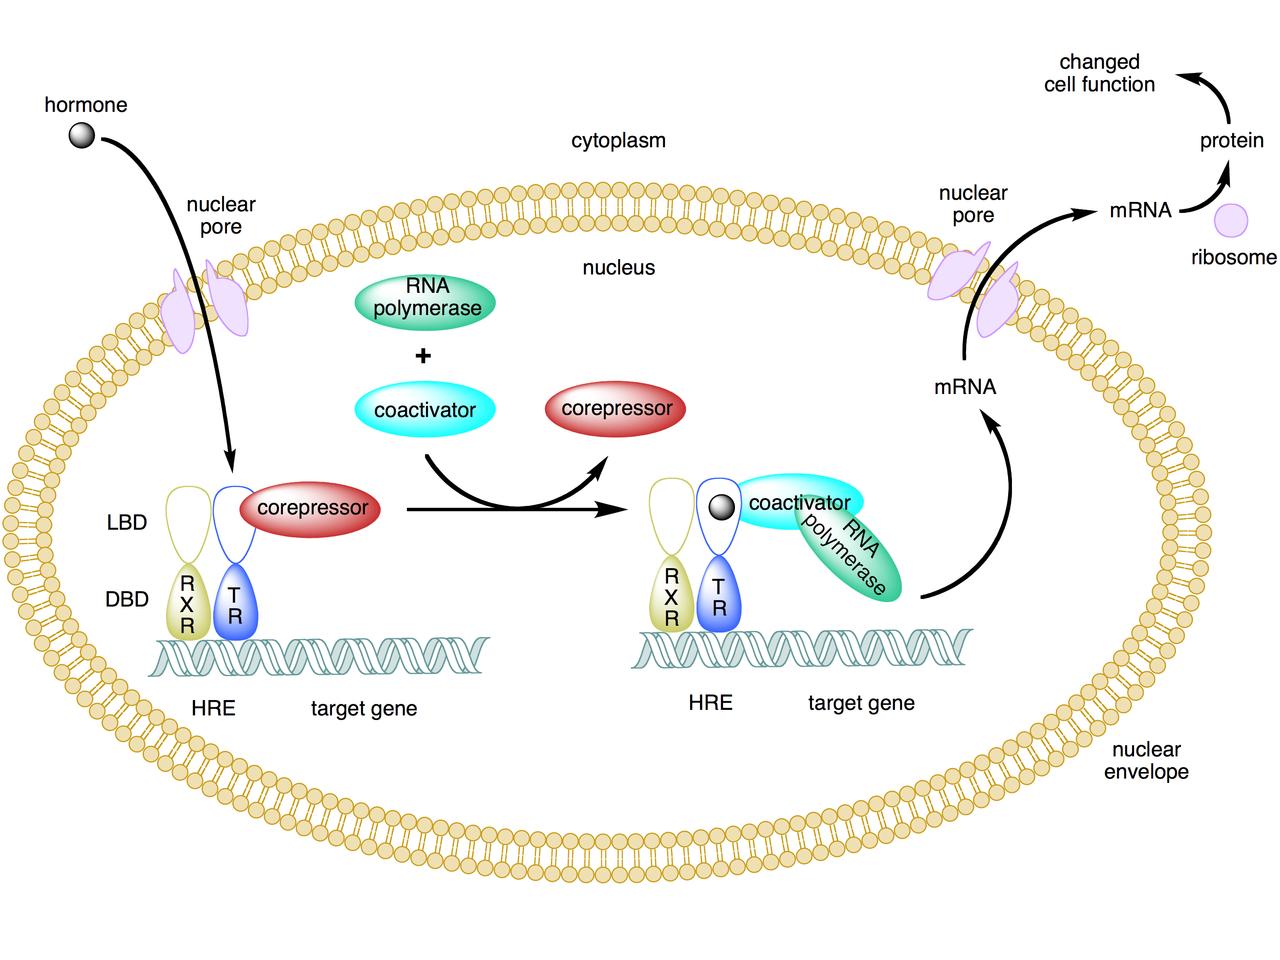 genomic steroid hormone action